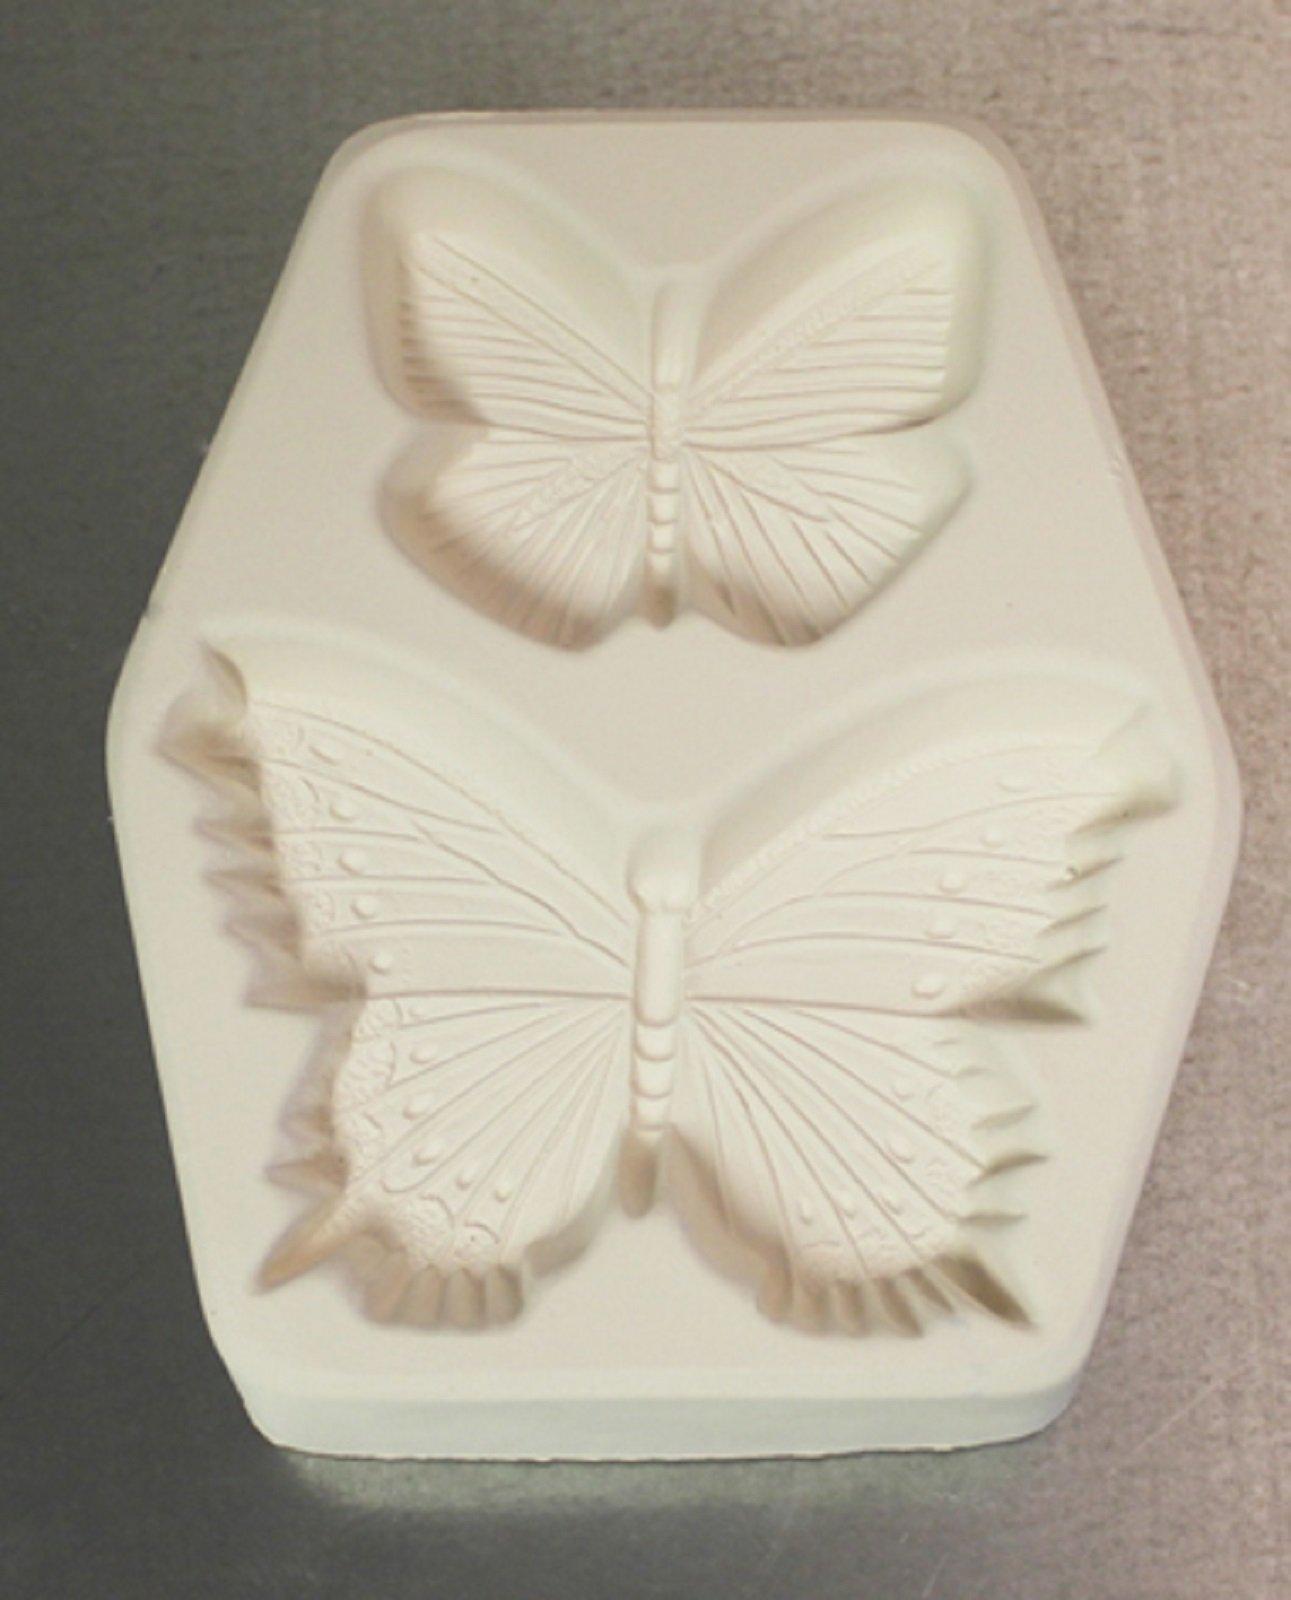 Lf114 2 Butterfly's Mold for Glass Kiln Firing Frit